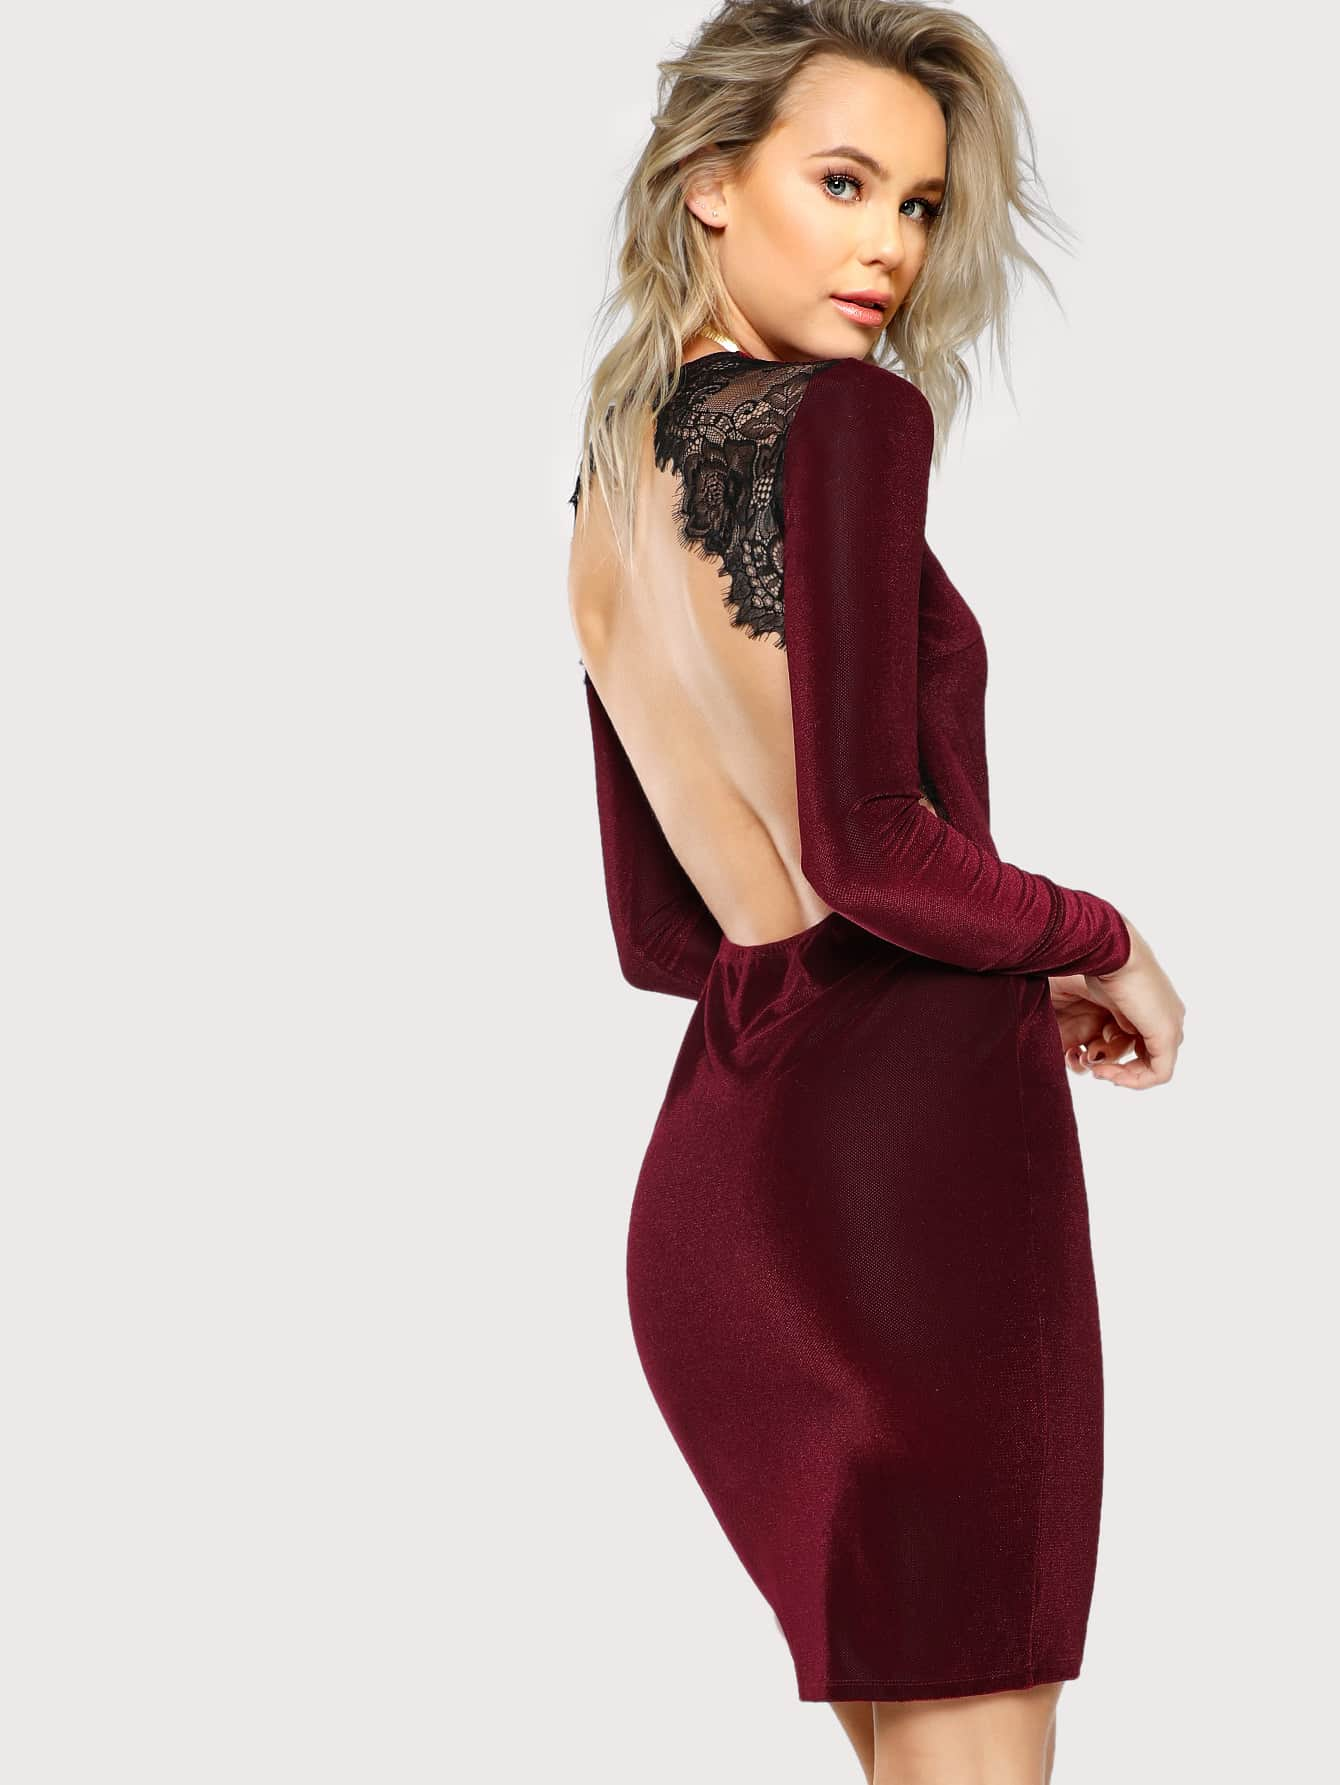 Lace Trim Open Back Dress dressmmc171019702